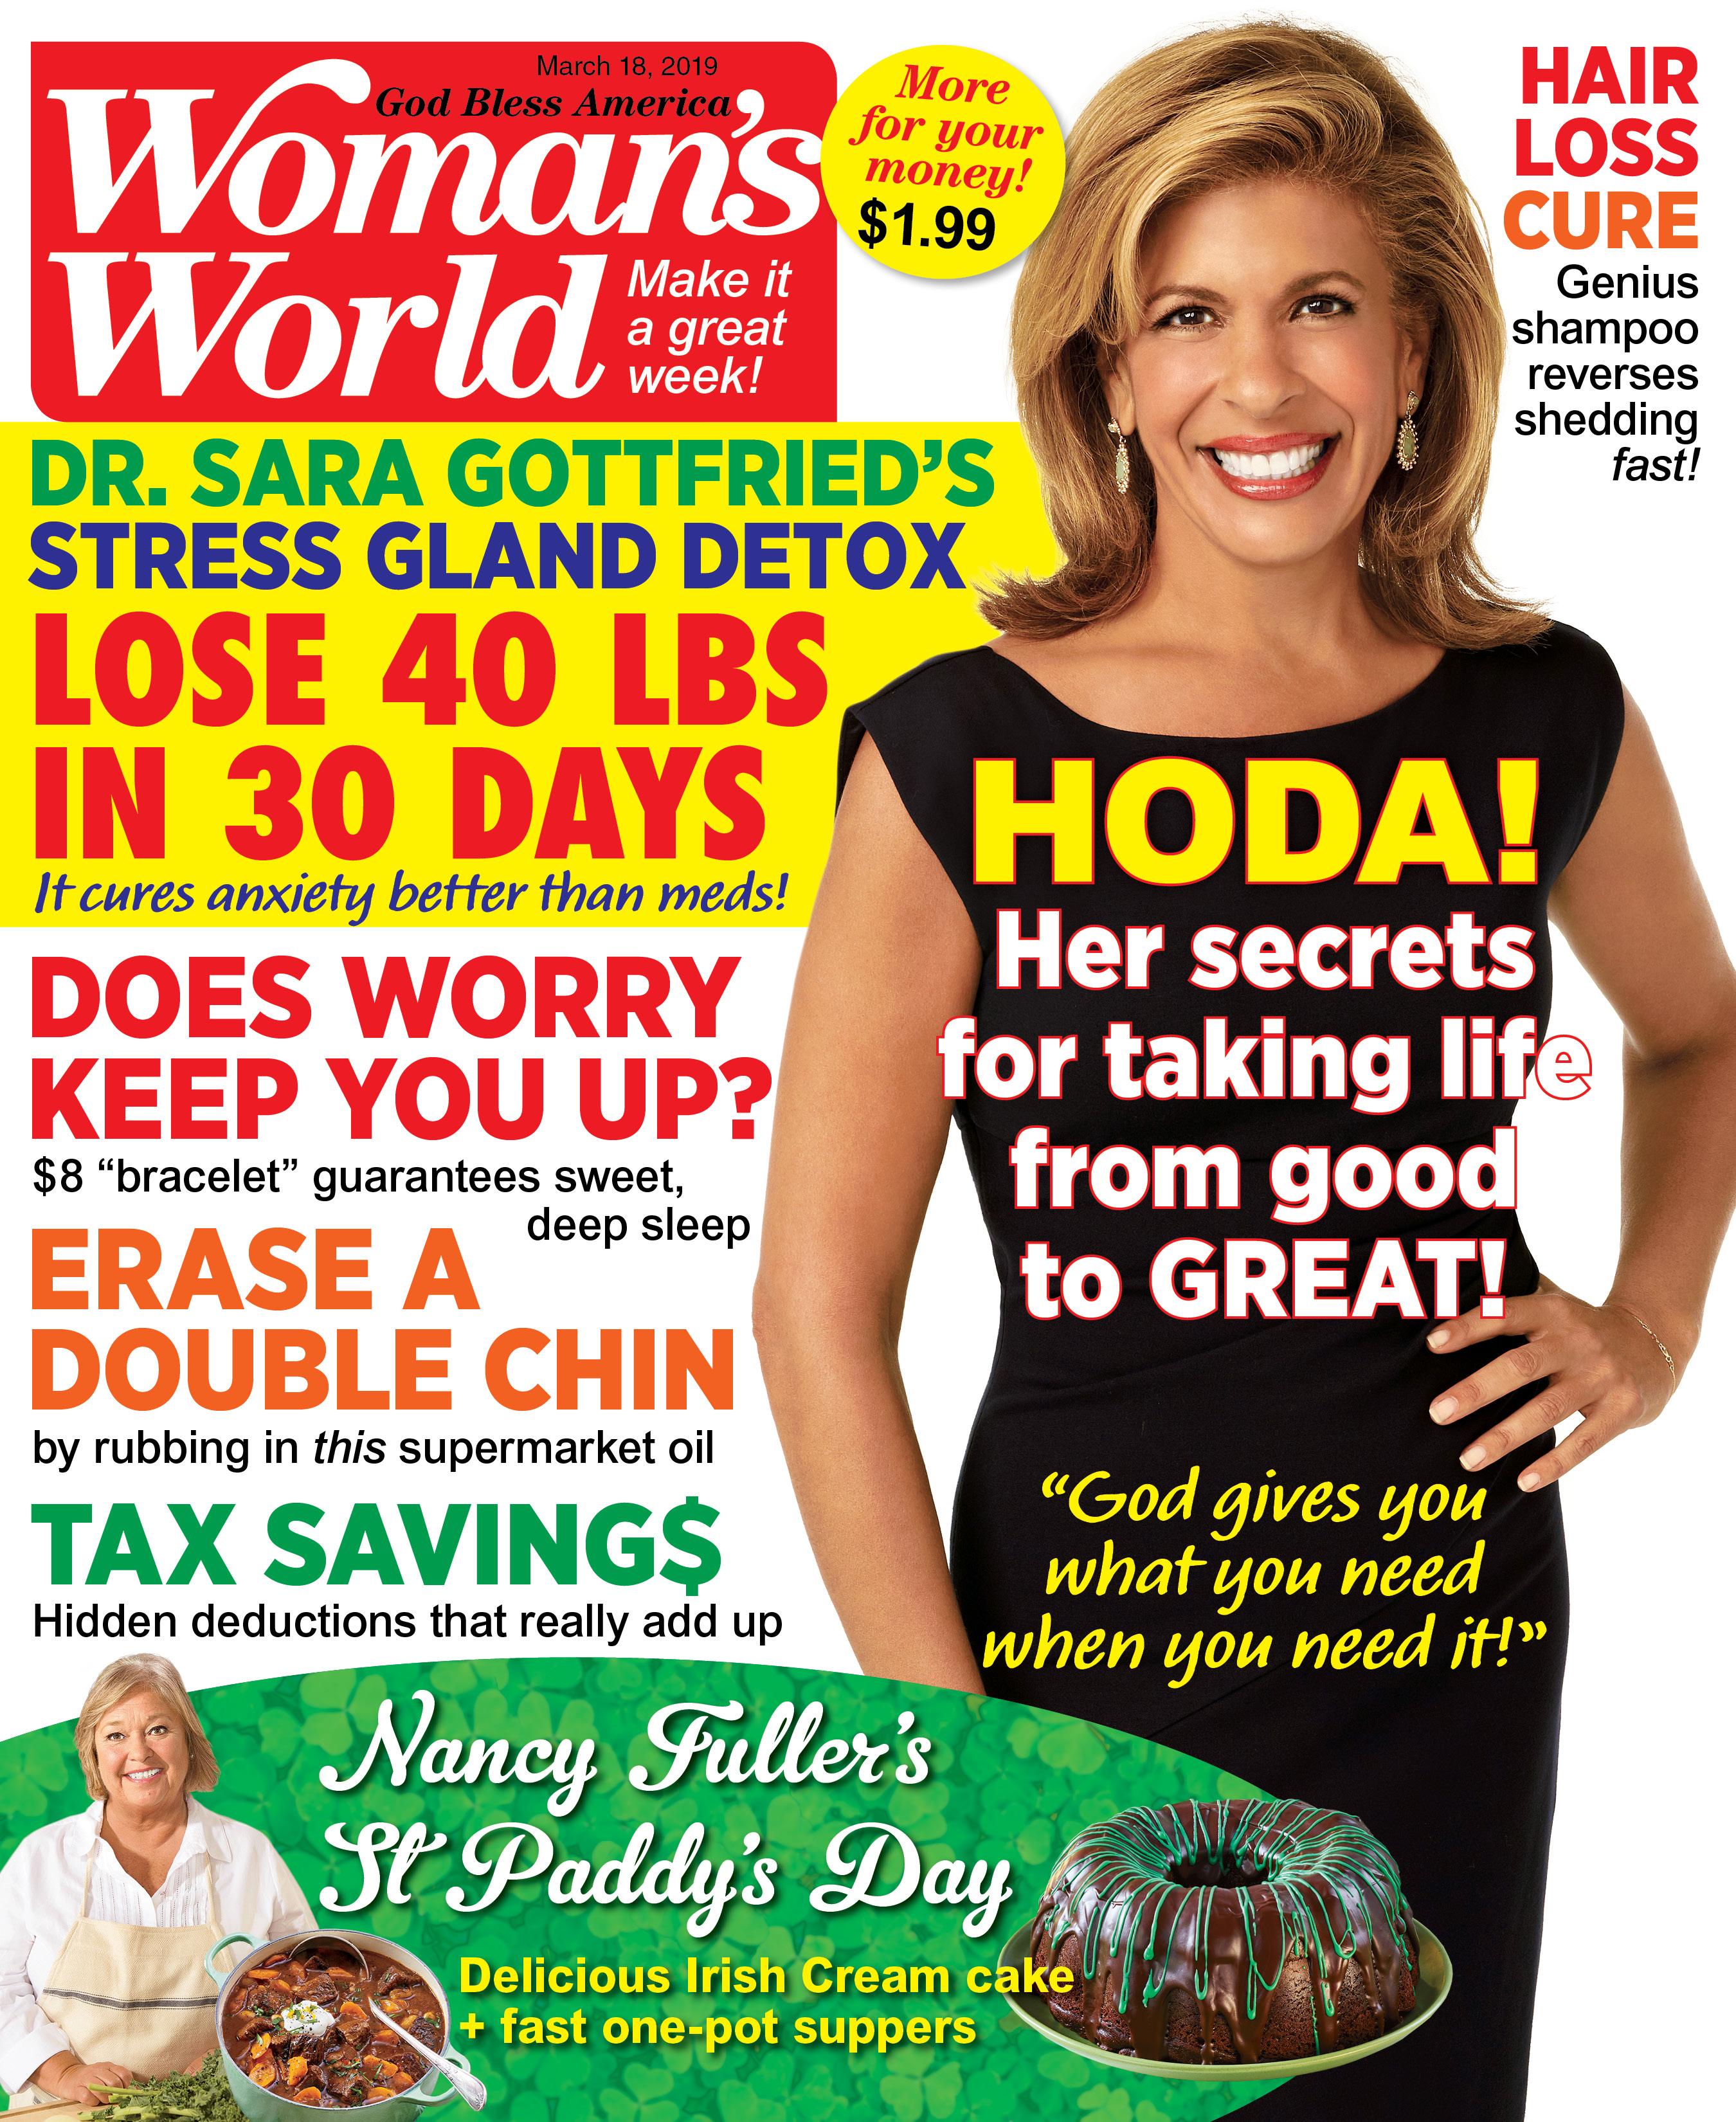 Hoda Kotb on the cover of Woman's World